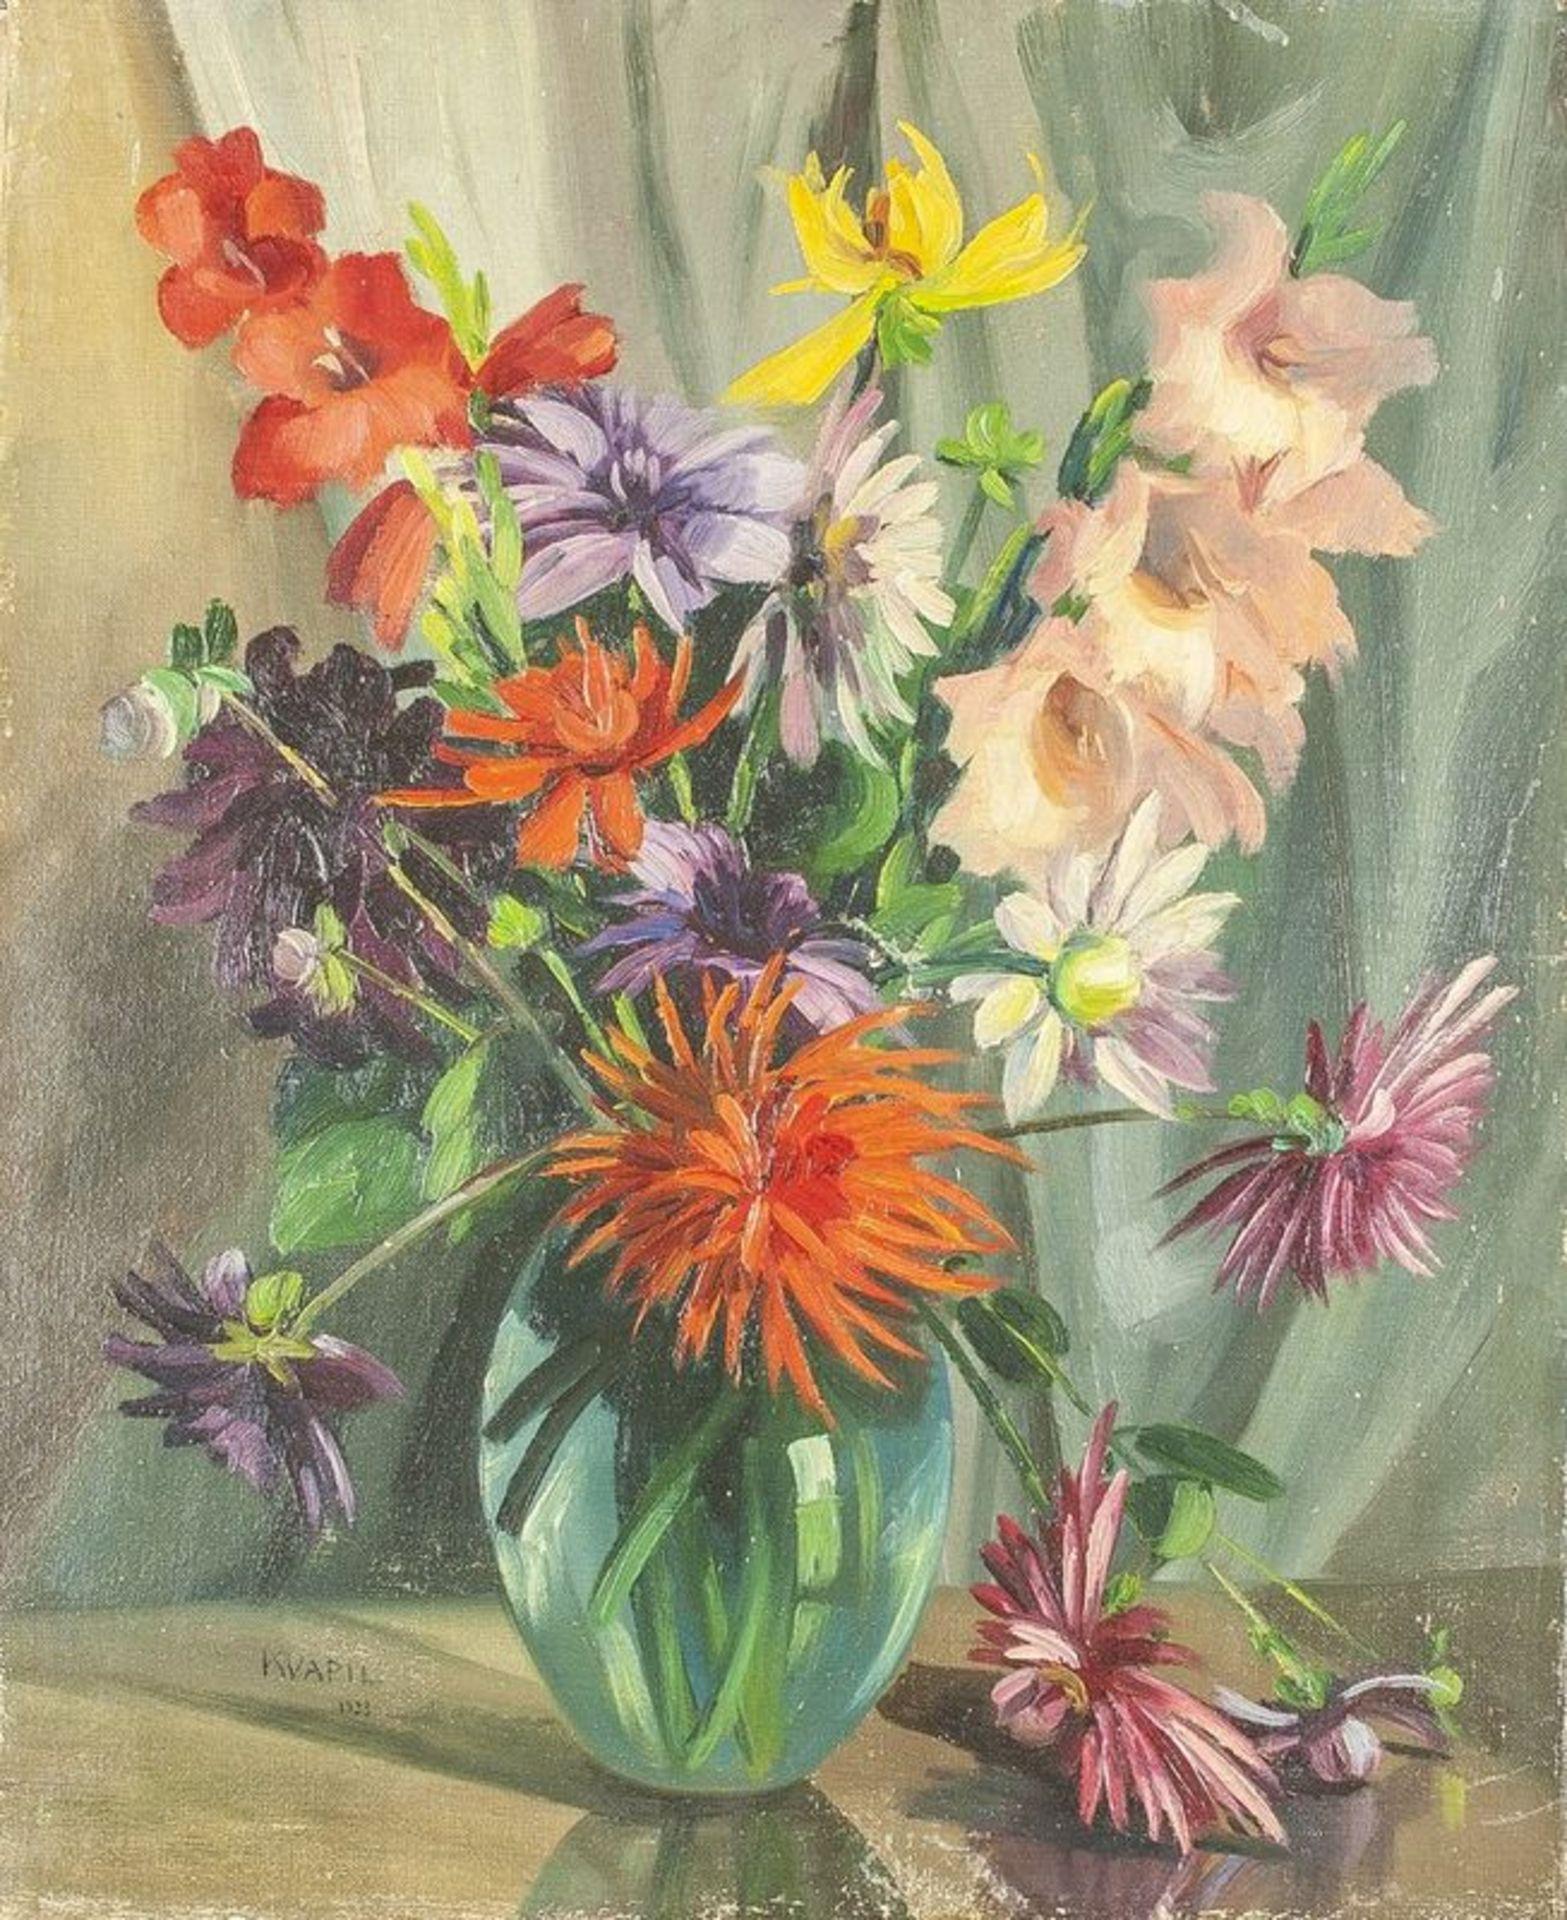 Los 608 - CHARLES KVAPIL (1884-1957) Flowers - Signed and dated 'Kvapil 1933' Oil on [...]